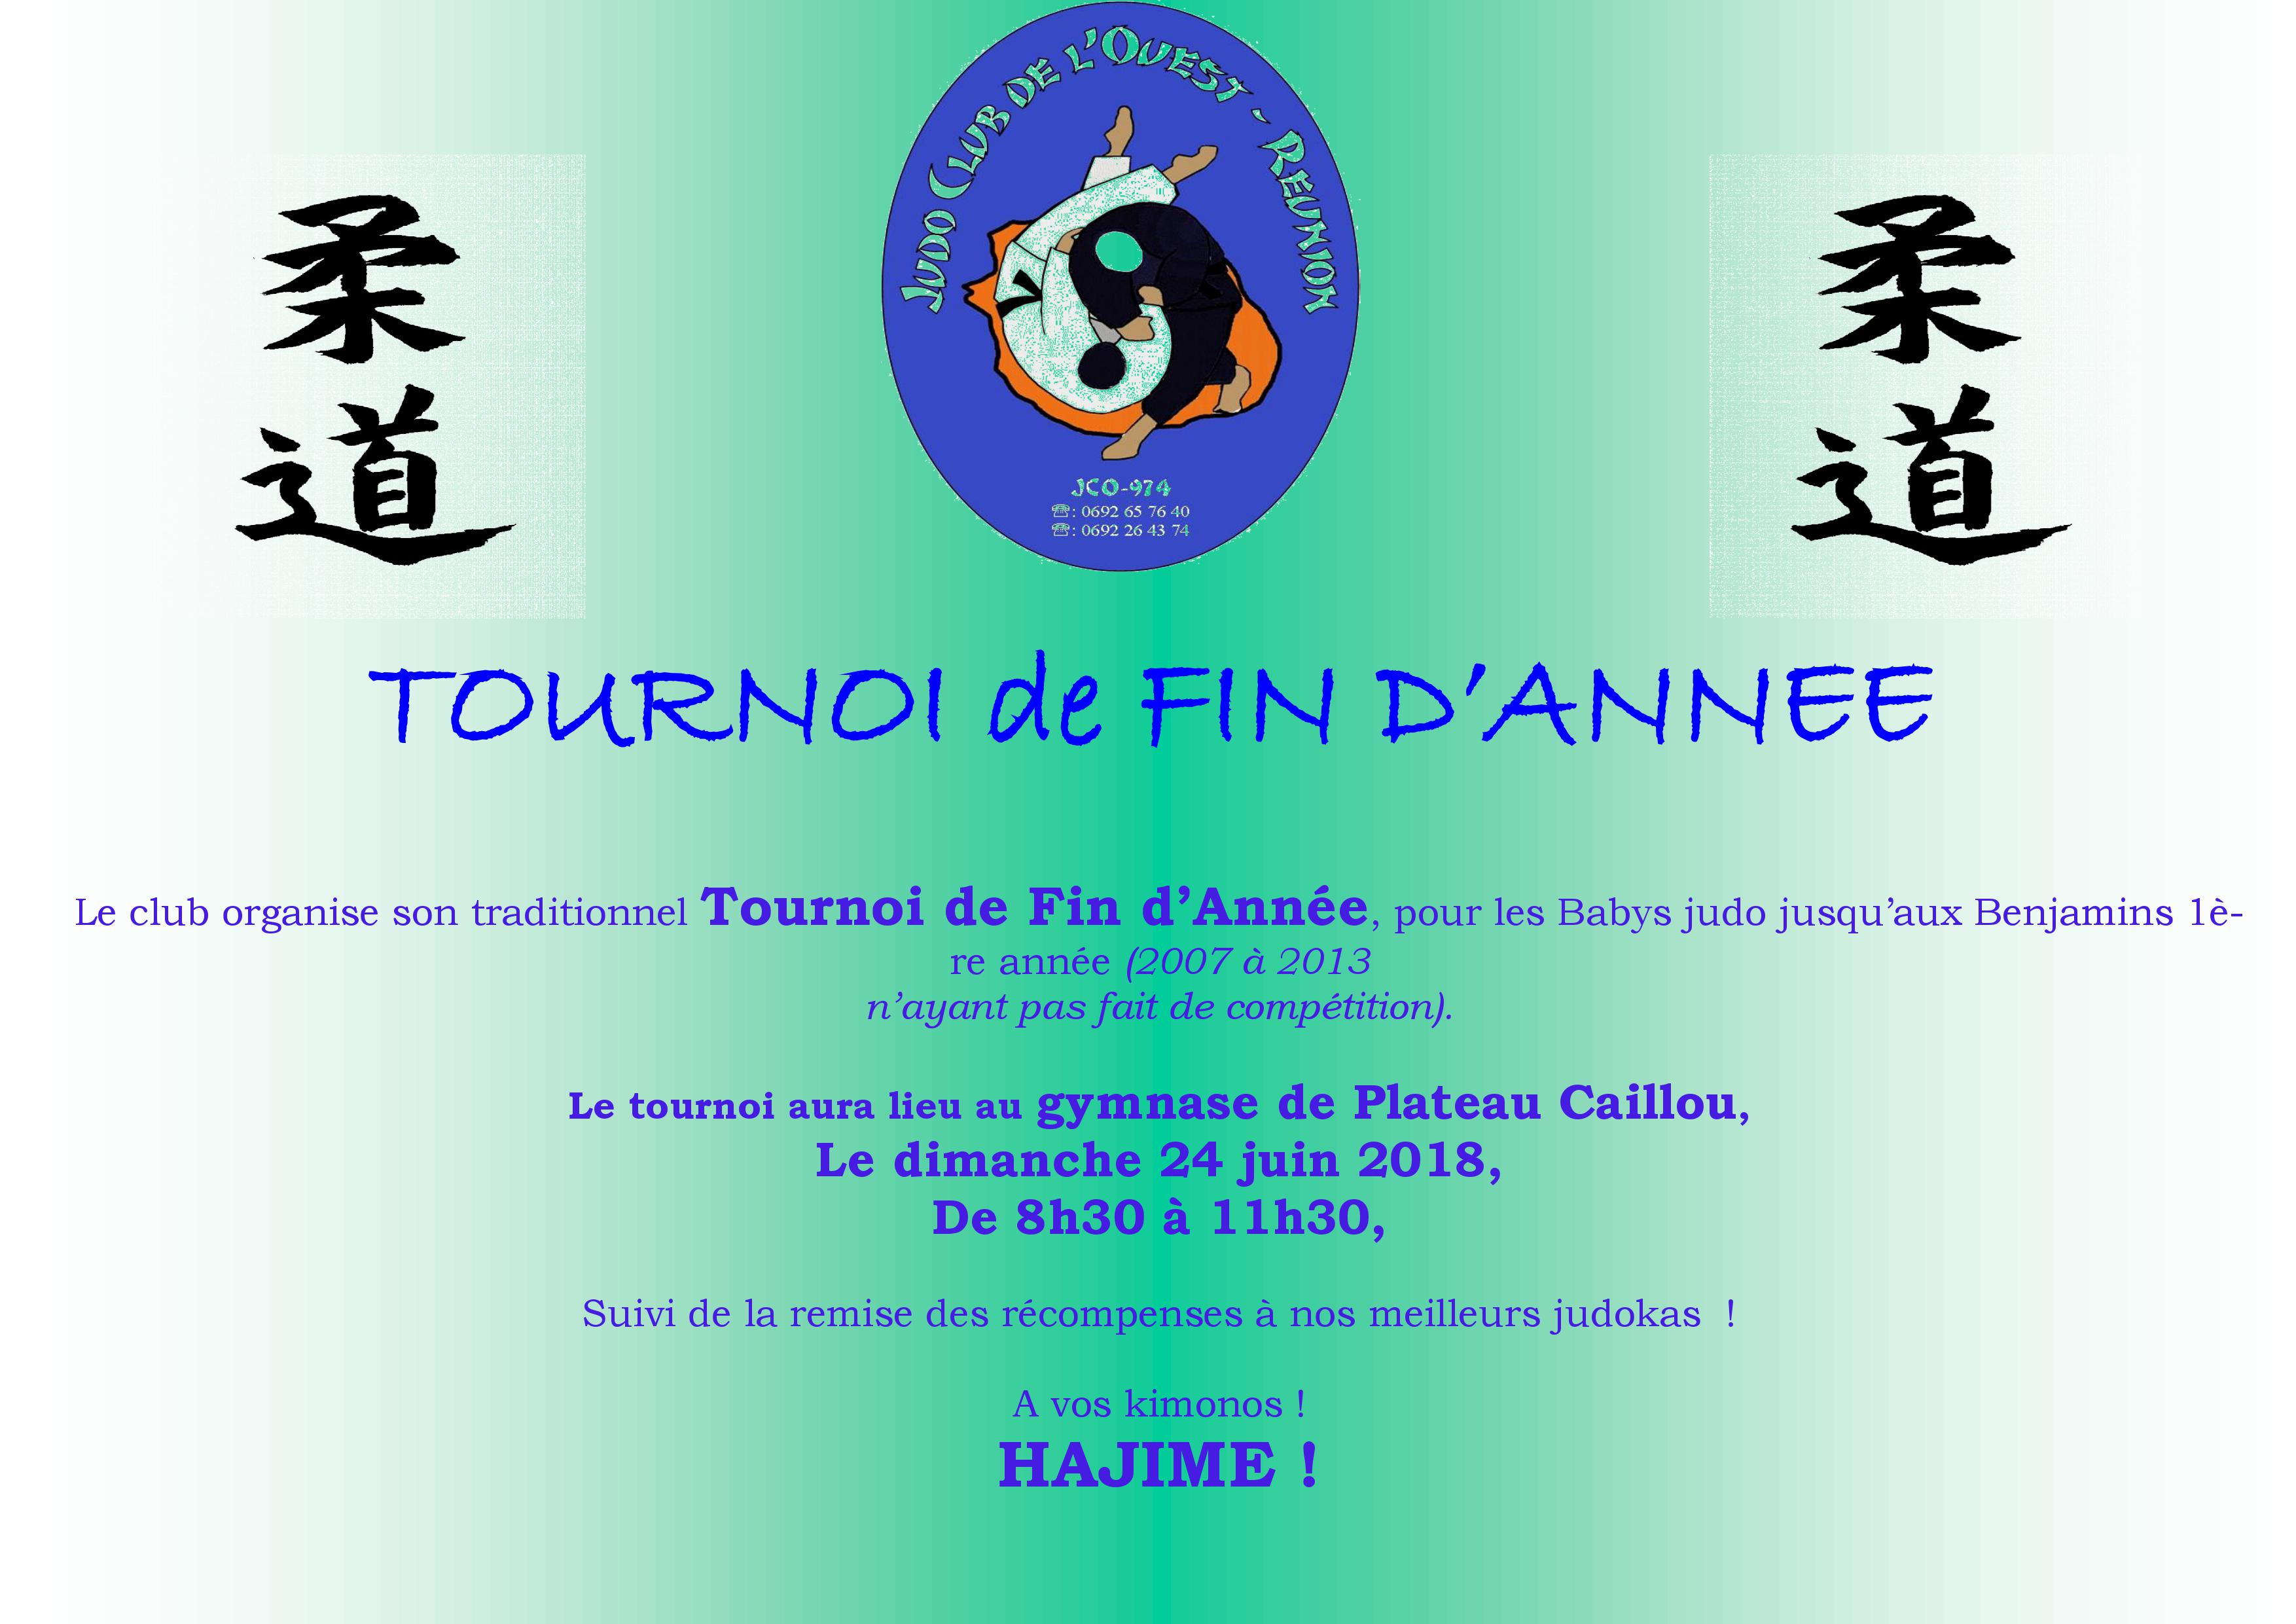 TOURNOI DE FIN D'ANNEE